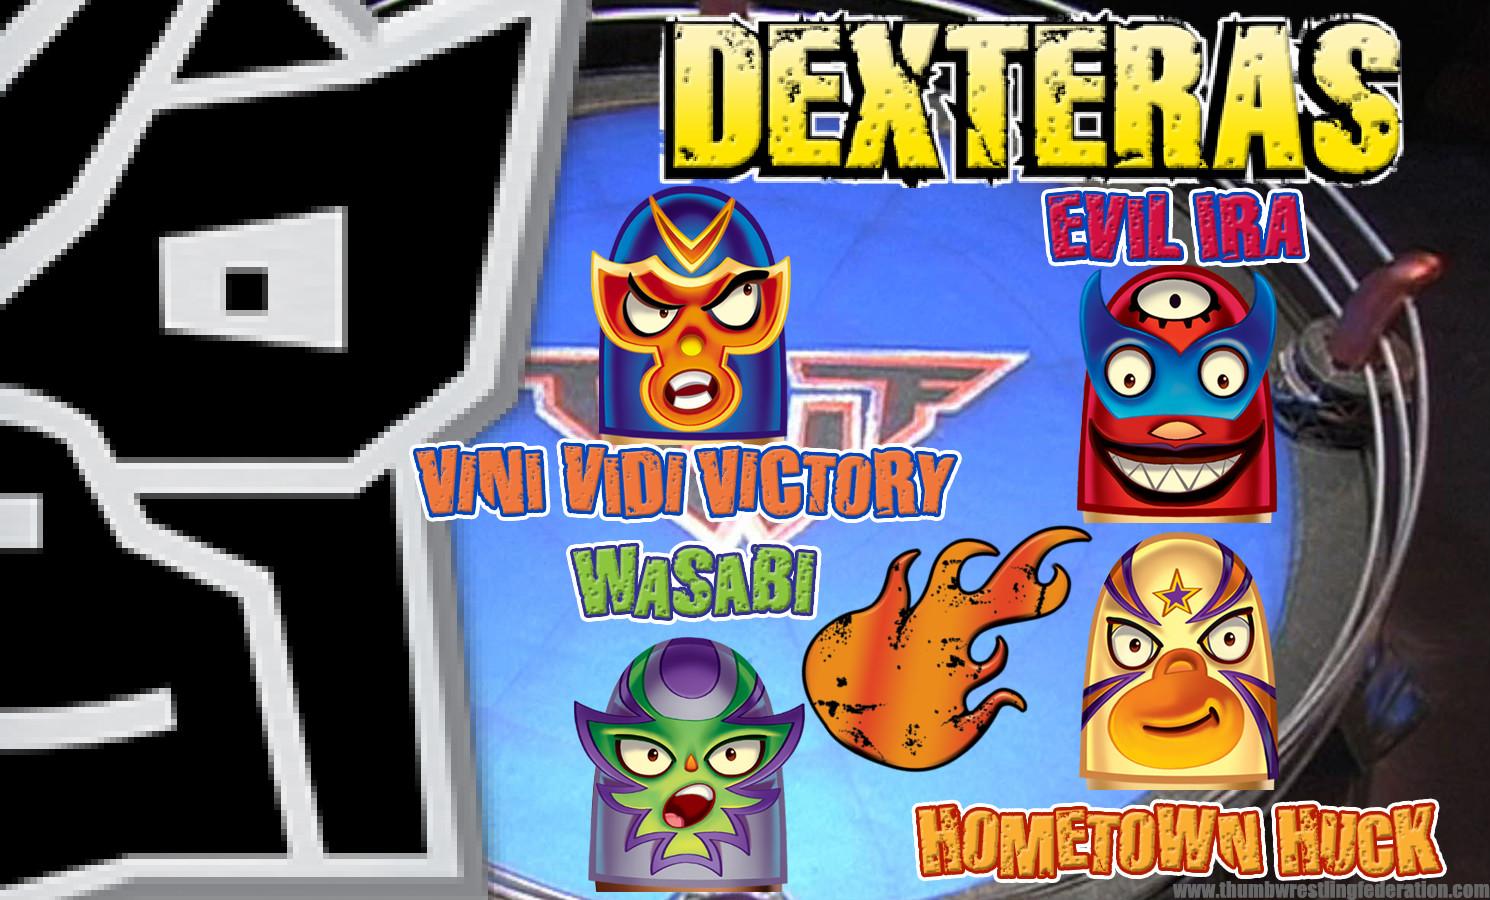 dexteras thumbwrestlingfederation wiki